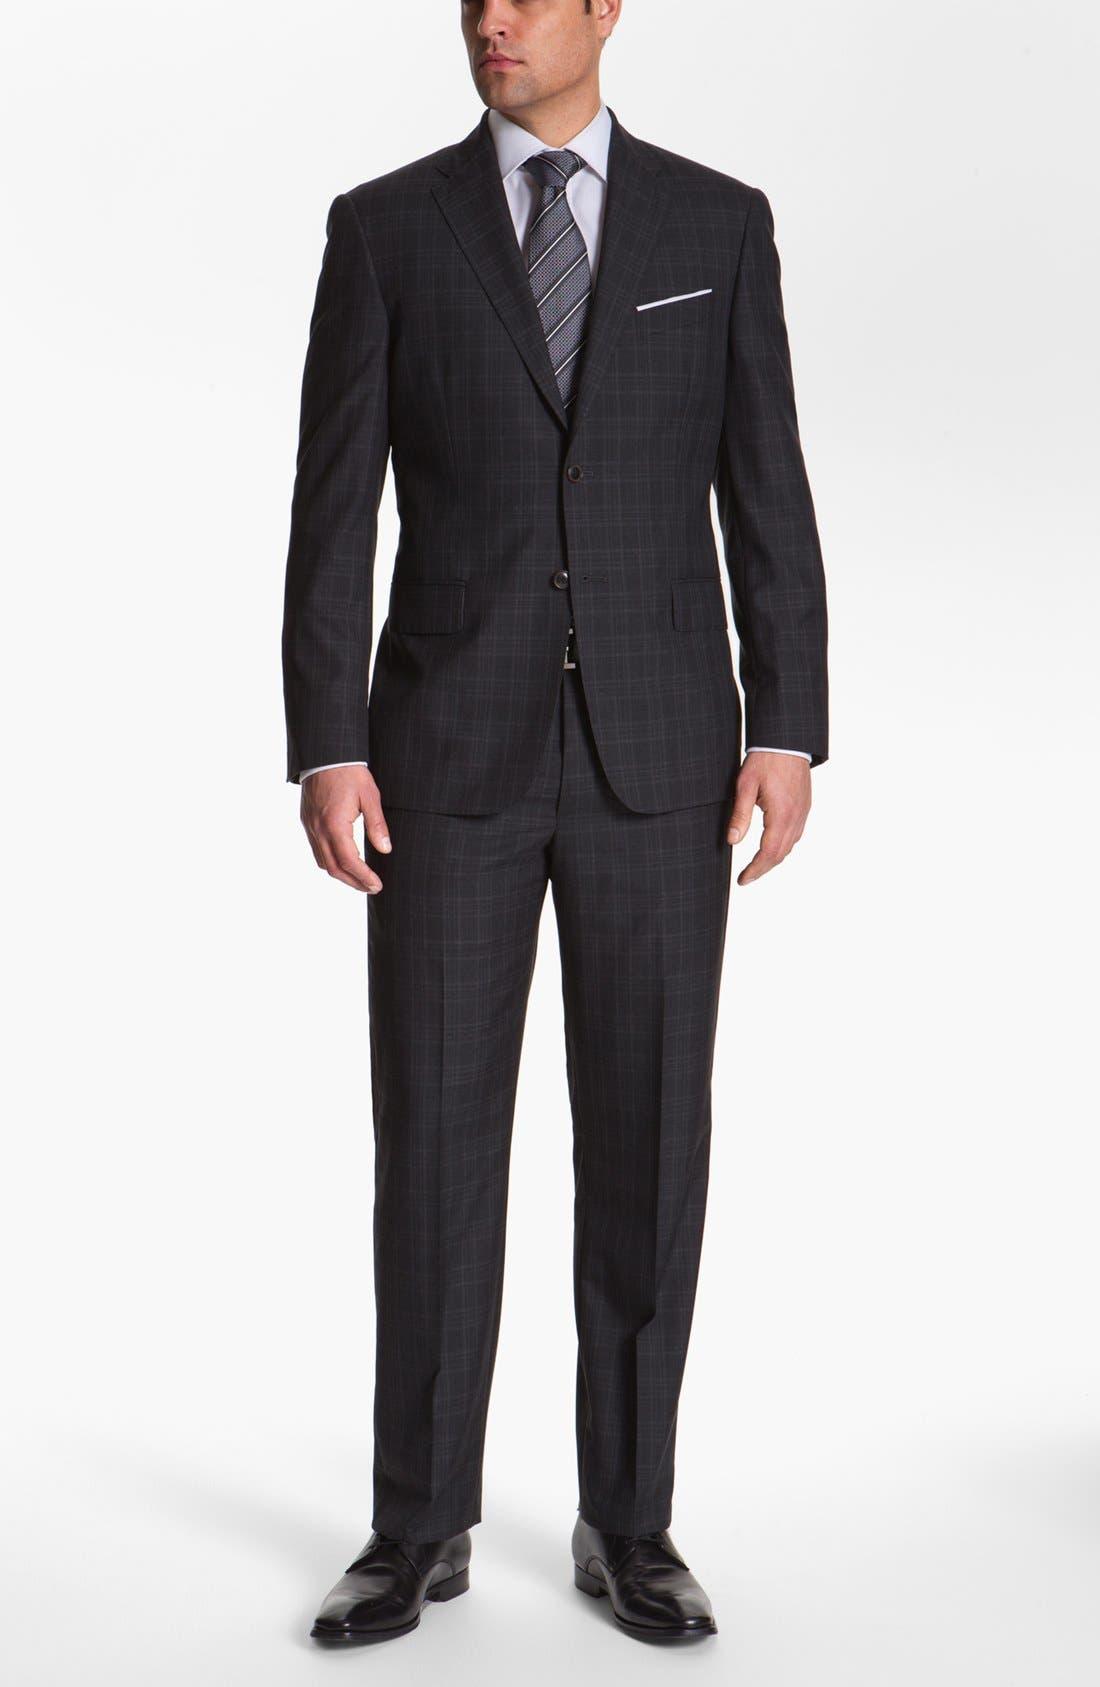 Alternate Image 1 Selected - Joseph Abboud 'Platinum' Plaid Wool Suit